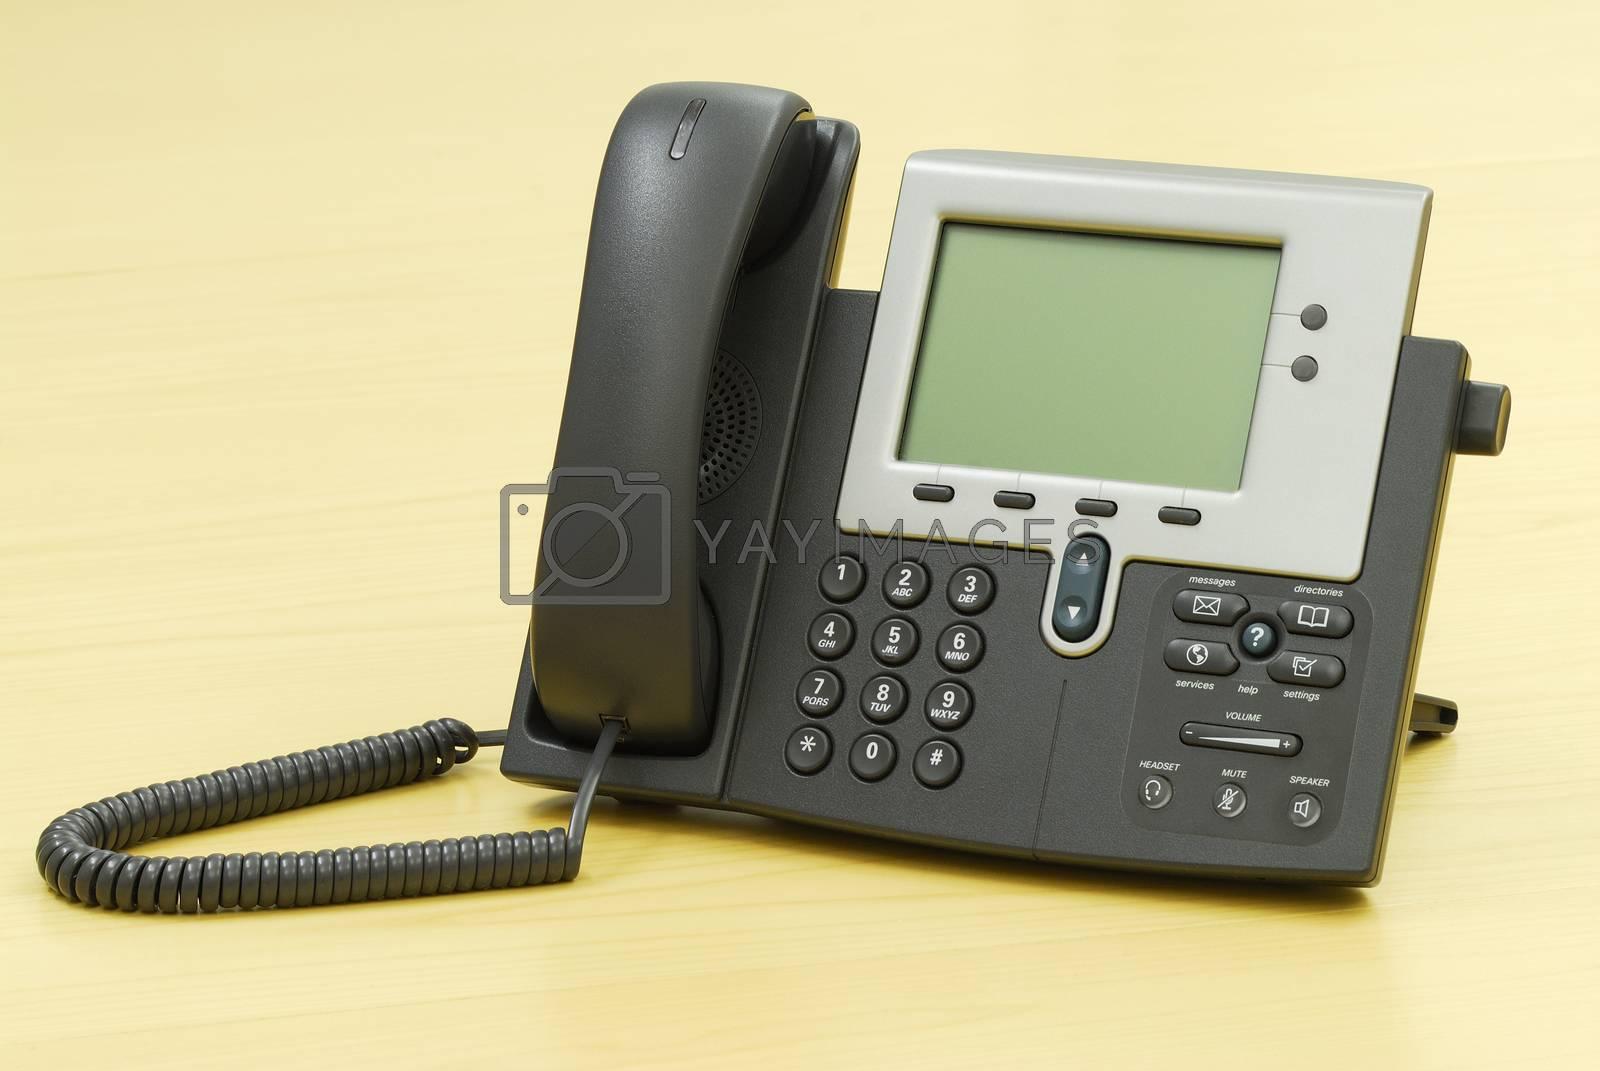 Digital VoIP phone on table.